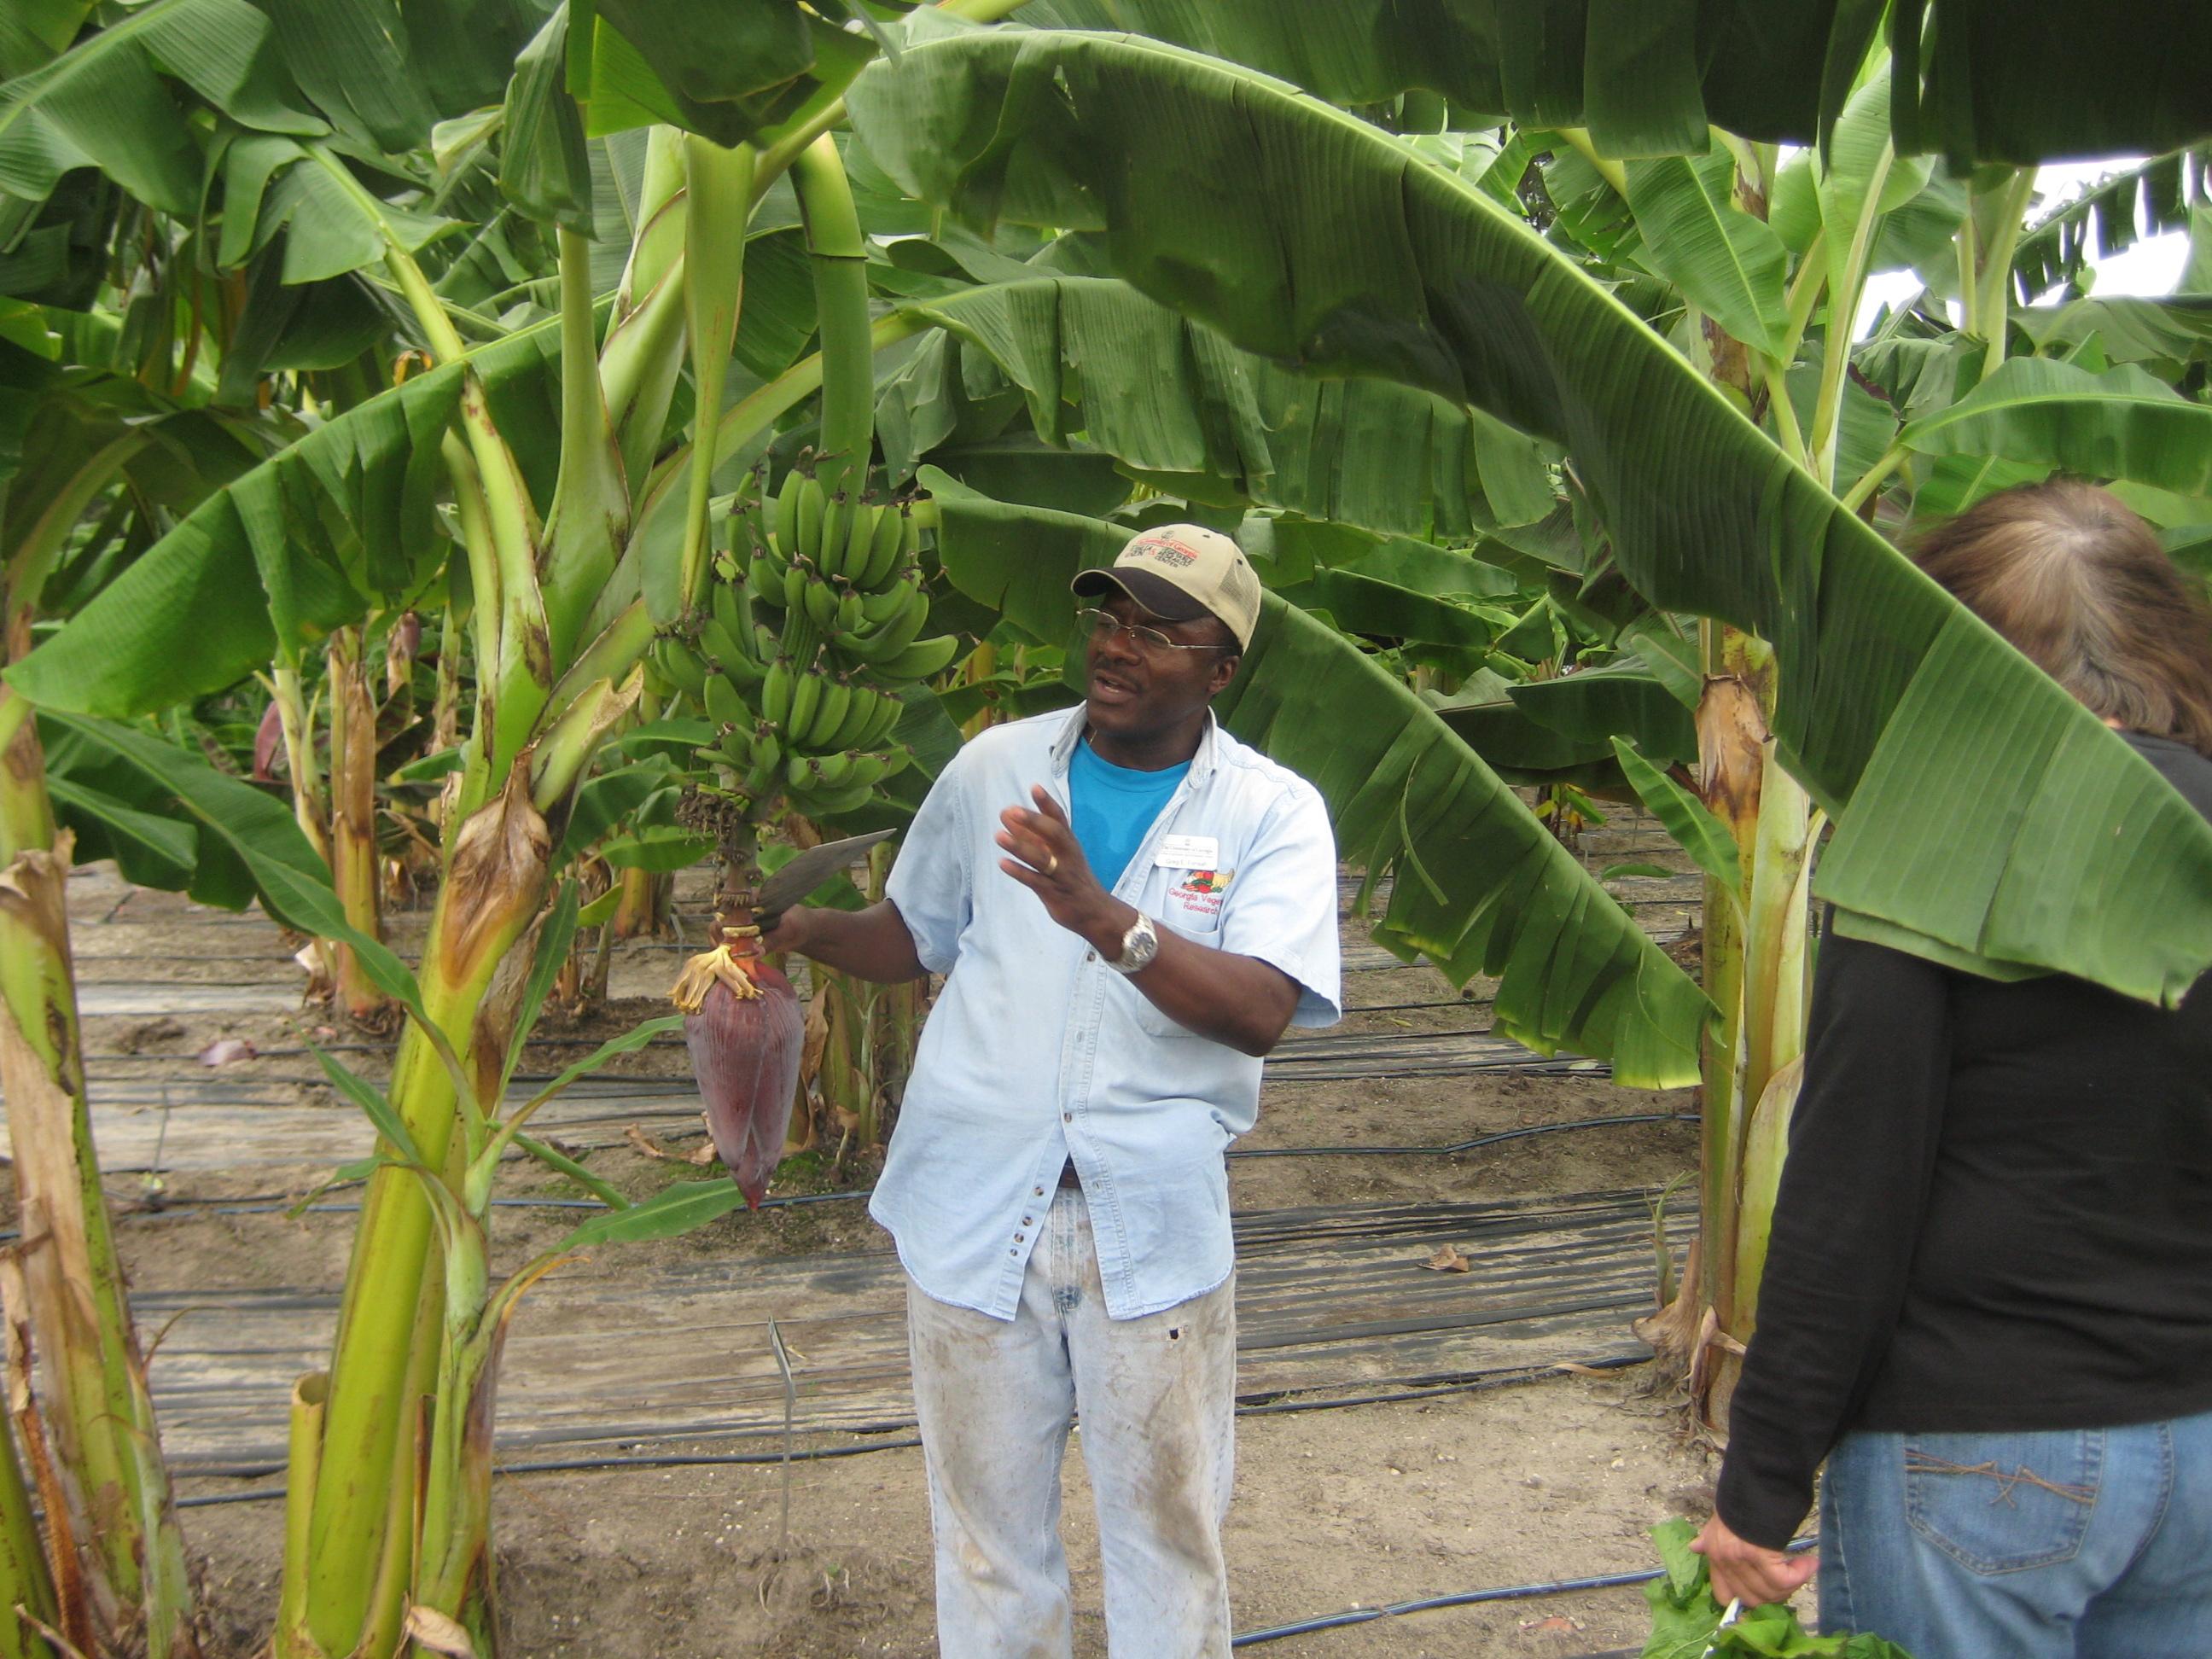 Greg Fonsah talks to guests viewing the banana trees on the UGA Tifton Campus.